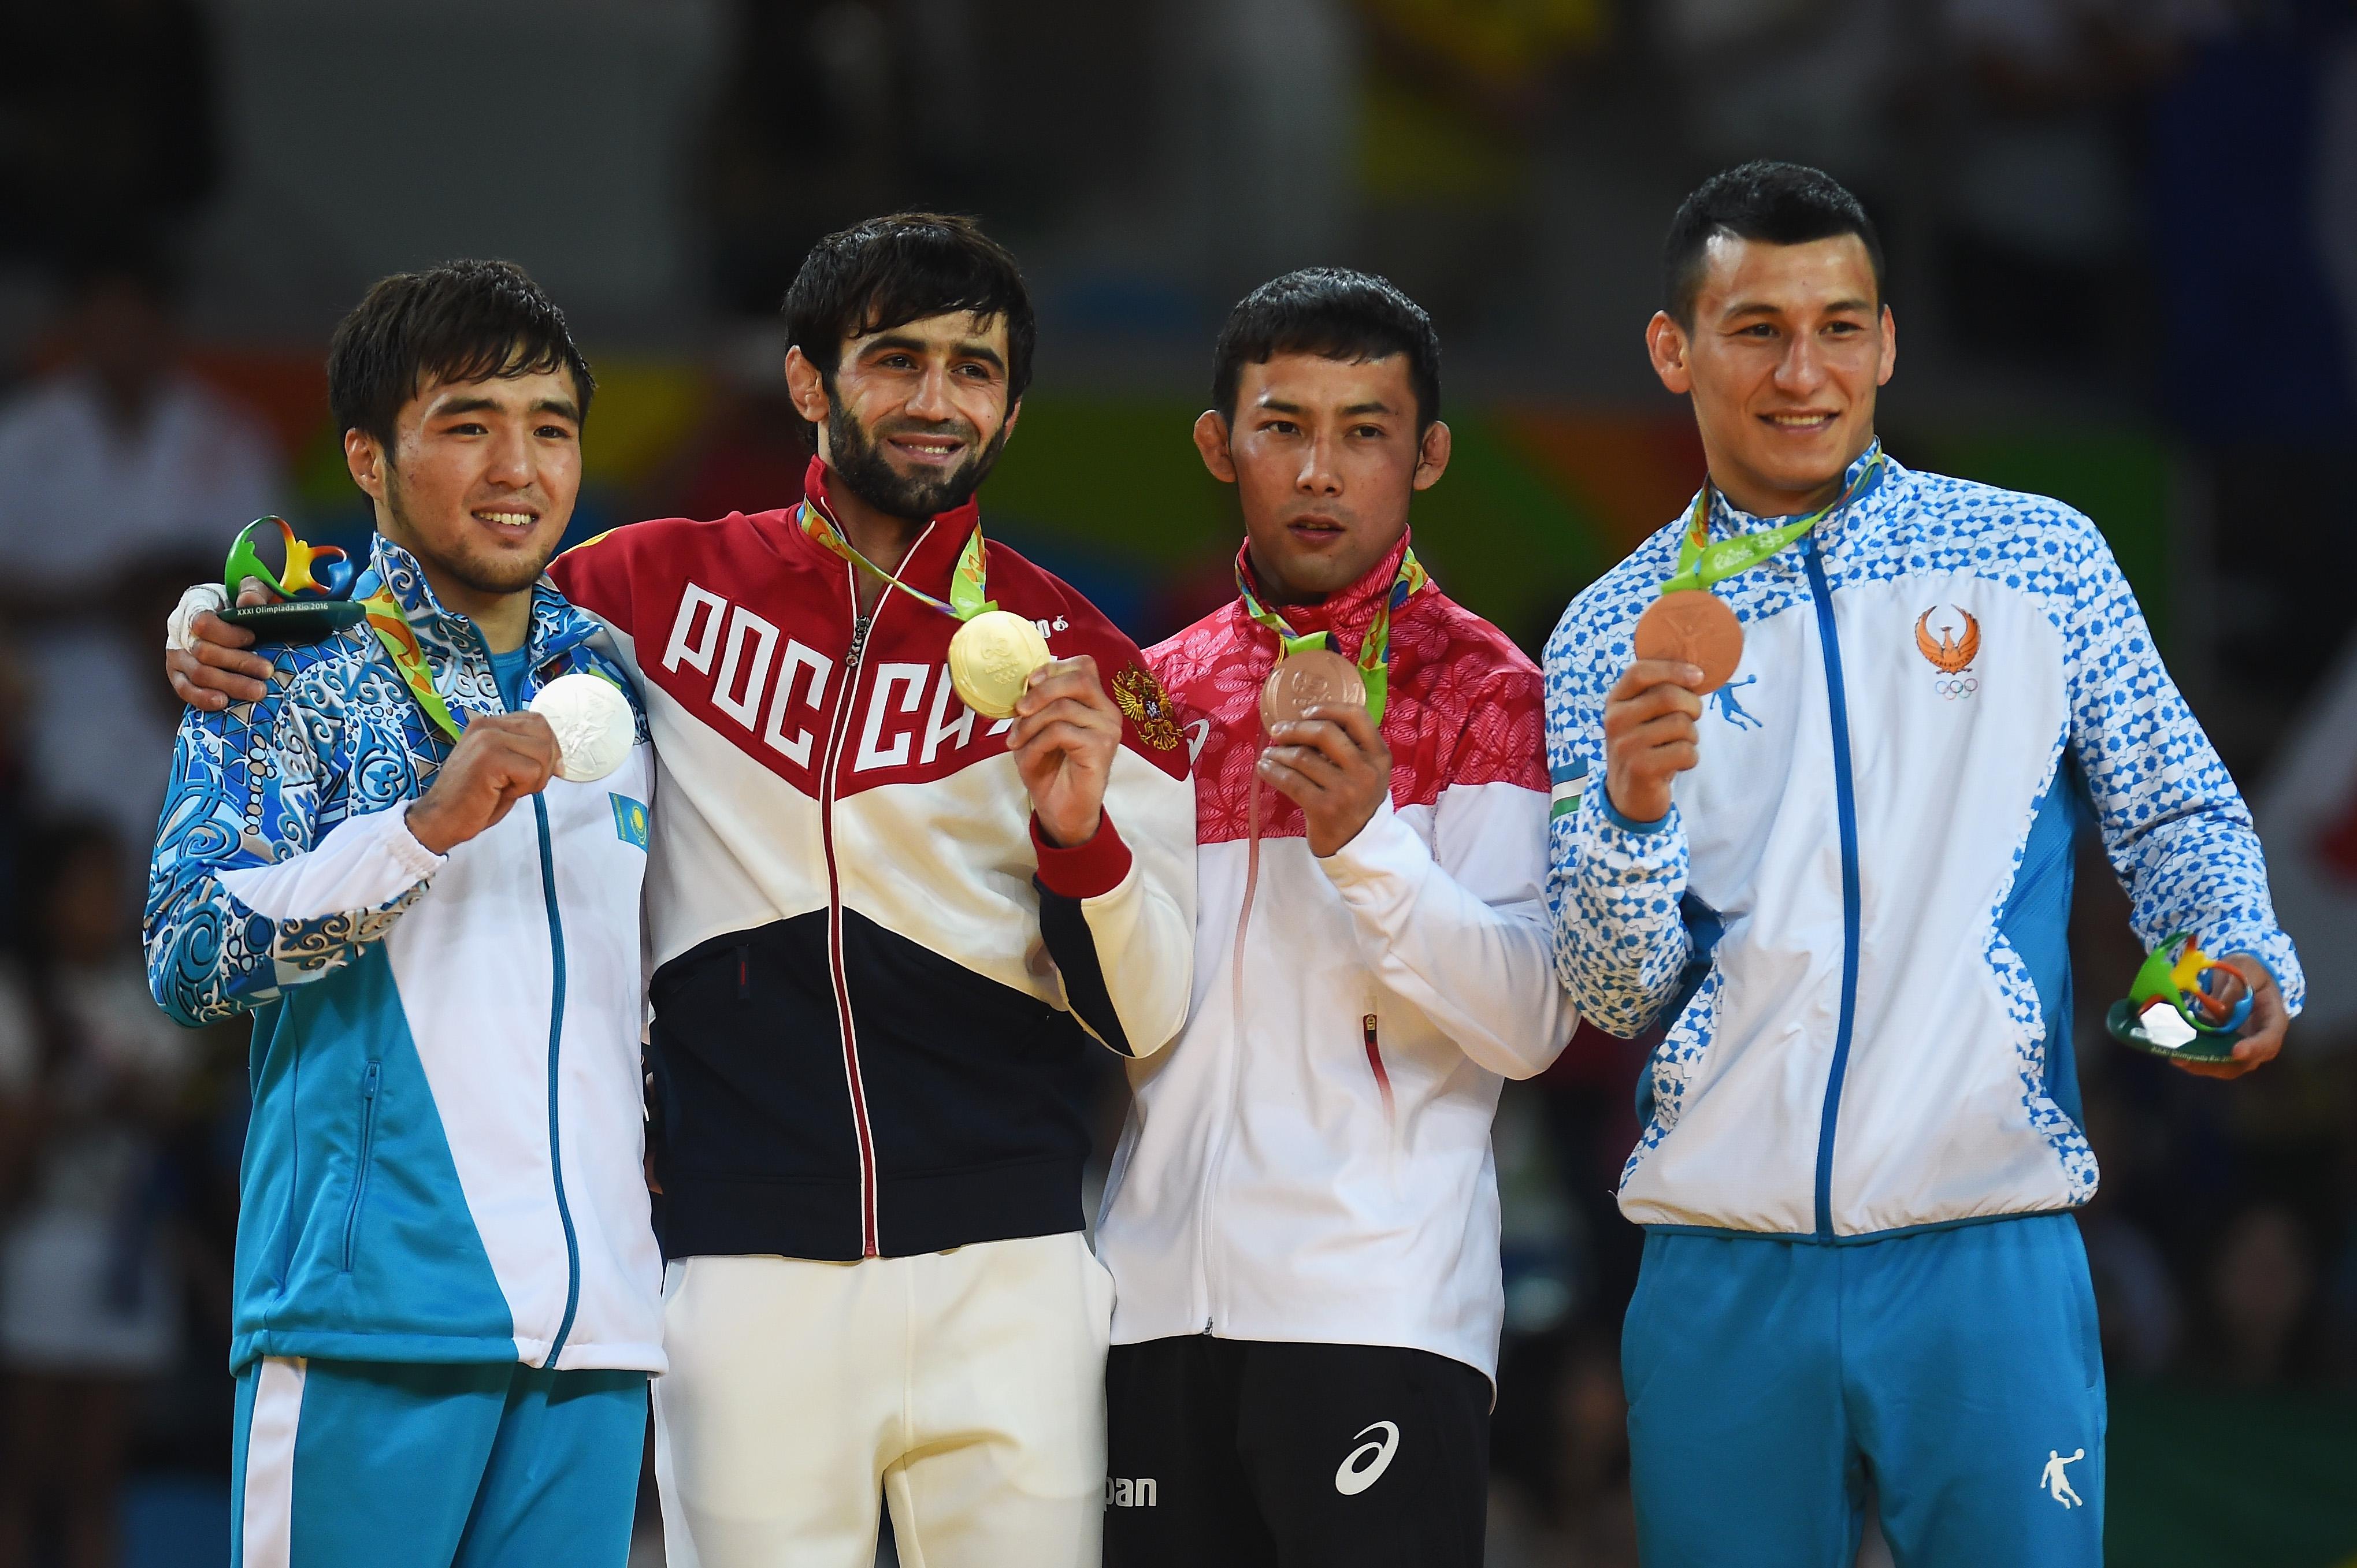 ВРио-де-Жанейро прошла церемония поднятия флага Кыргызстана